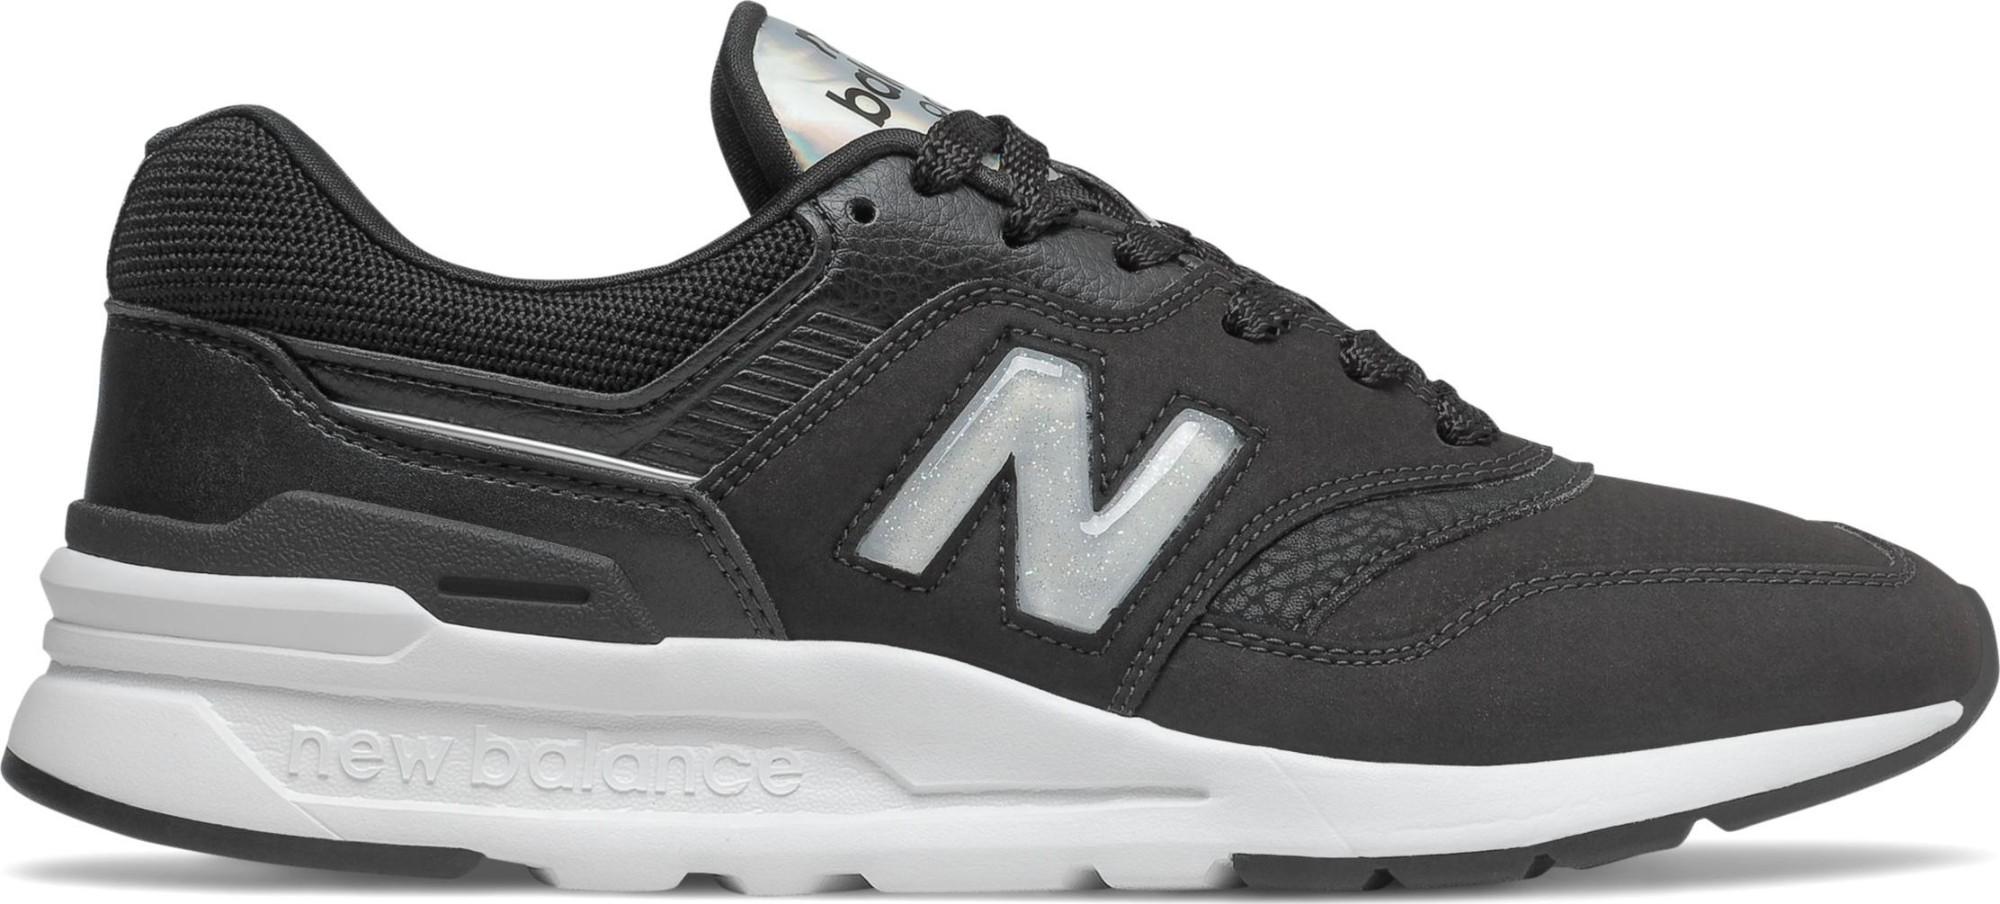 New Balance CW997 Black HBN 37,5